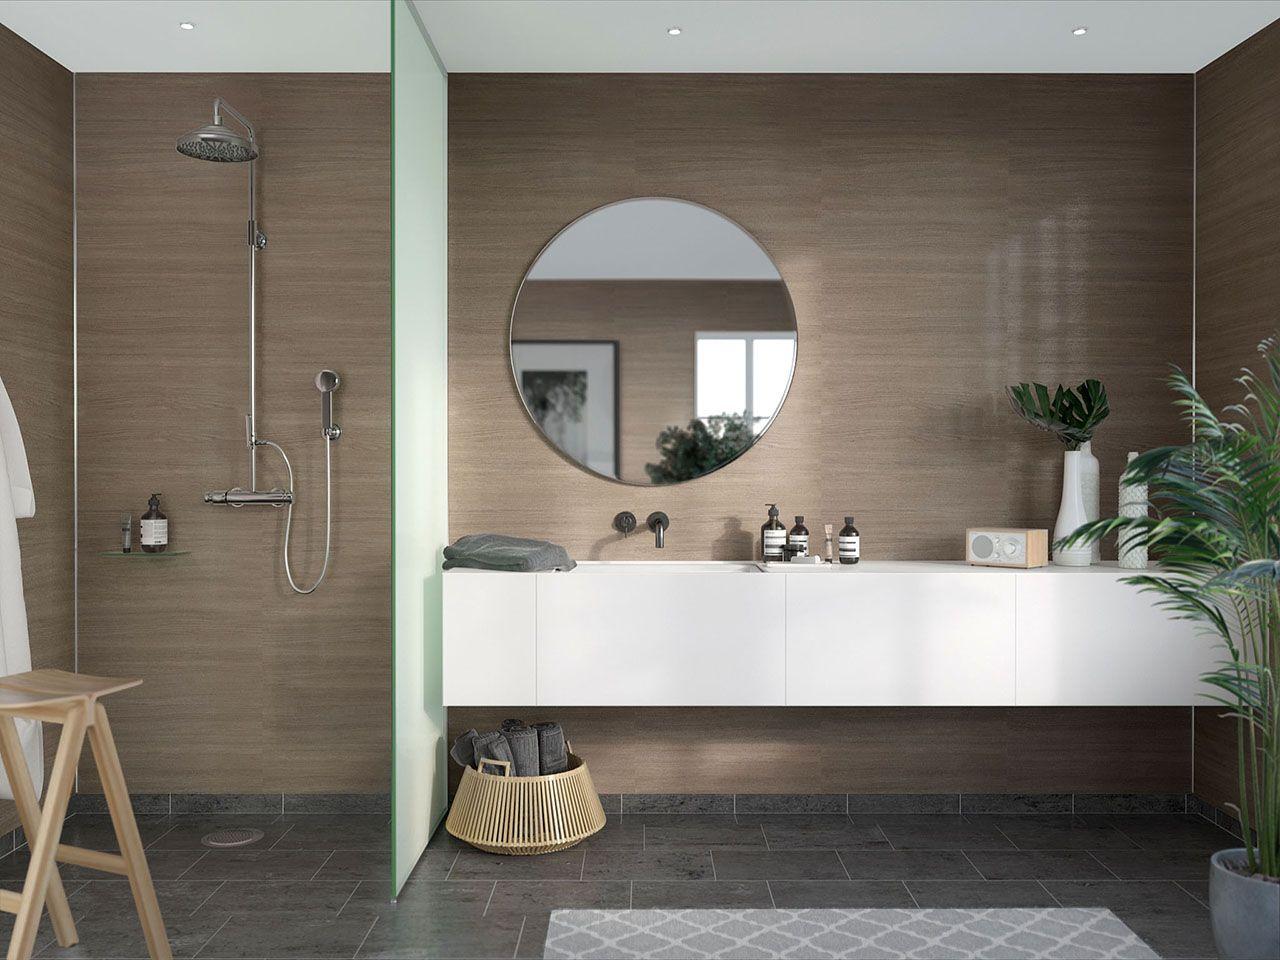 Spa Look With Laminate Shower Walls Marina Grey Oak Diy Friendly Innovate Building Solutions Bathroom Wall Panels Round Mirror Bathroom Cement Bathroom